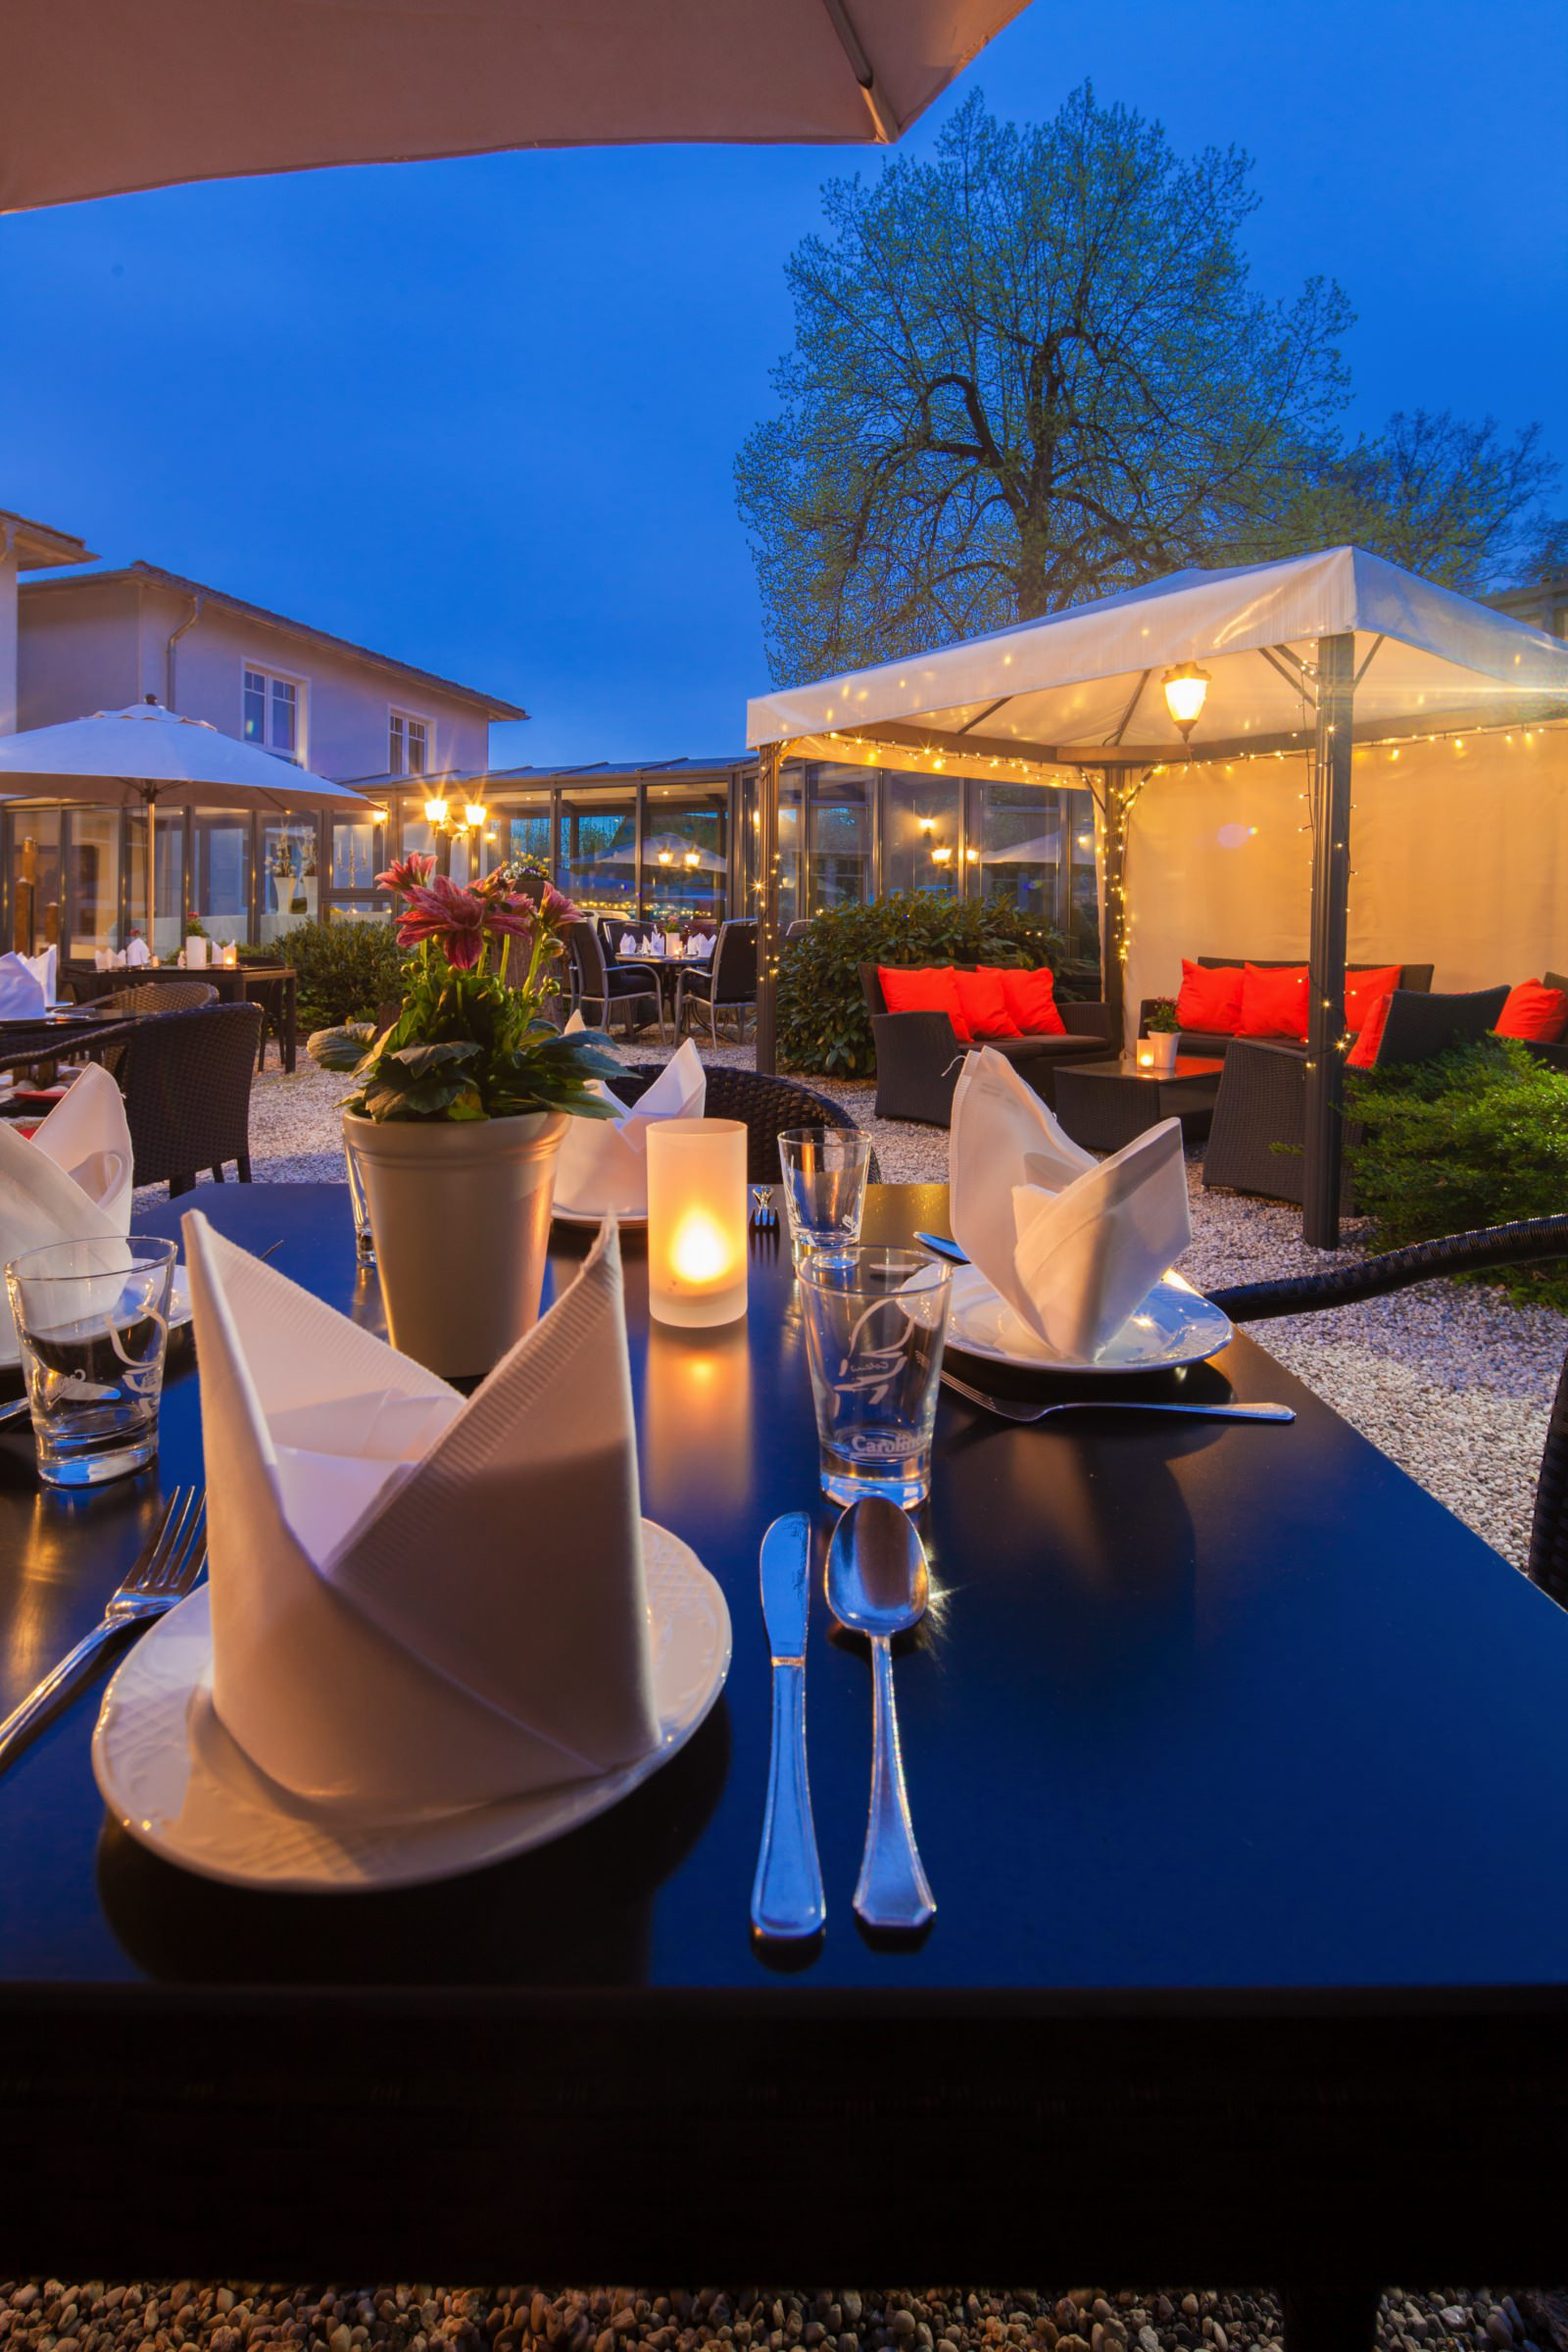 Sommergarten   Parkhotel Bielefeld   Restaurant MilserKrug